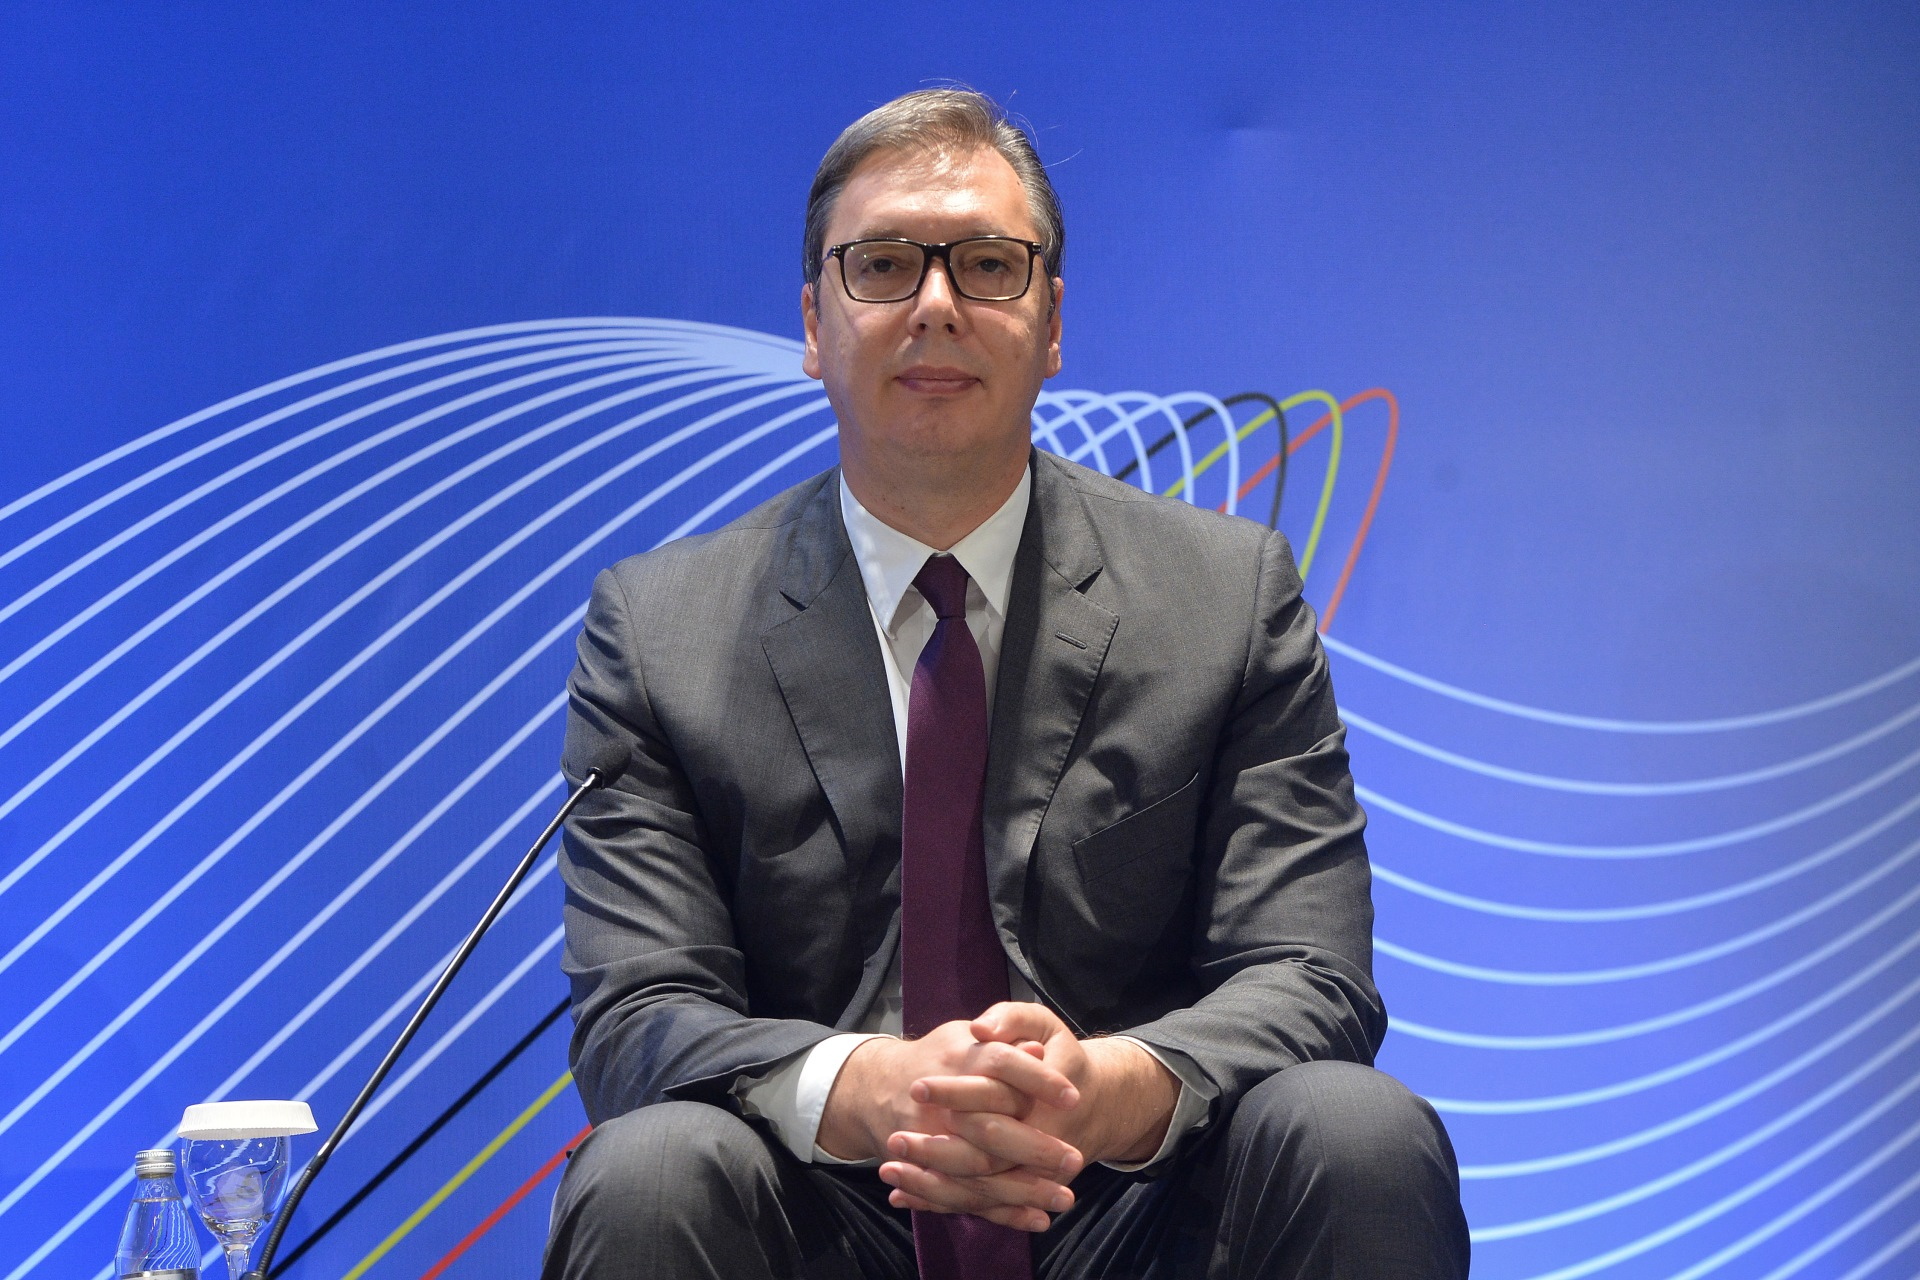 Predsednik Srbije Aleksandar Vucic i pocasni predsednik Evropskog saveta i bivsi premijer Velgije Hermean van Rompej na konferenciji EU i Srbija zajednička sudbina.